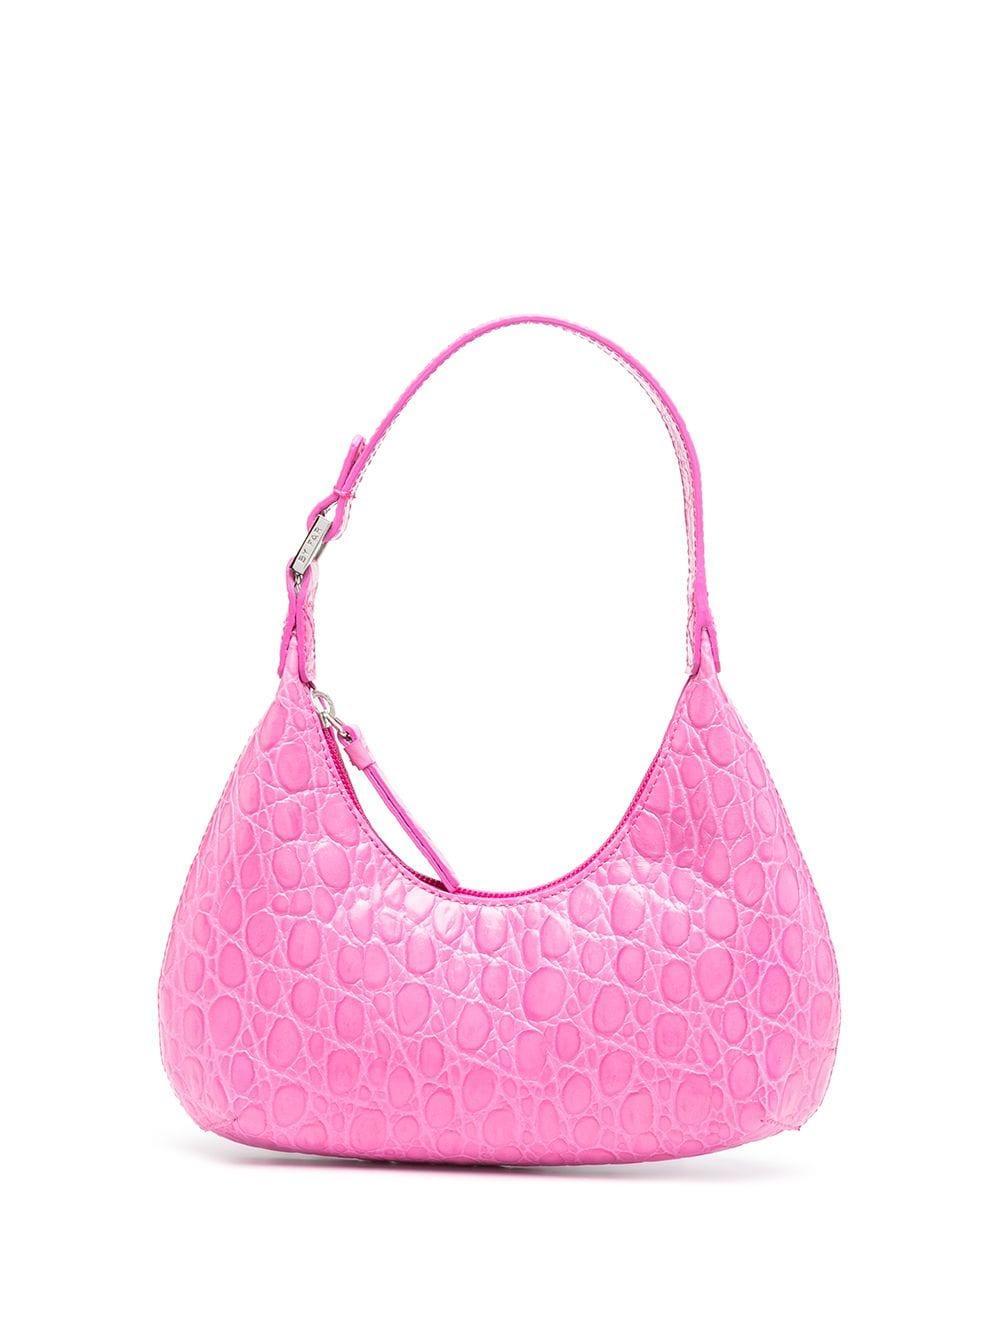 Baby Amber Croco Bag Item # 21CRBASFCHDSMA